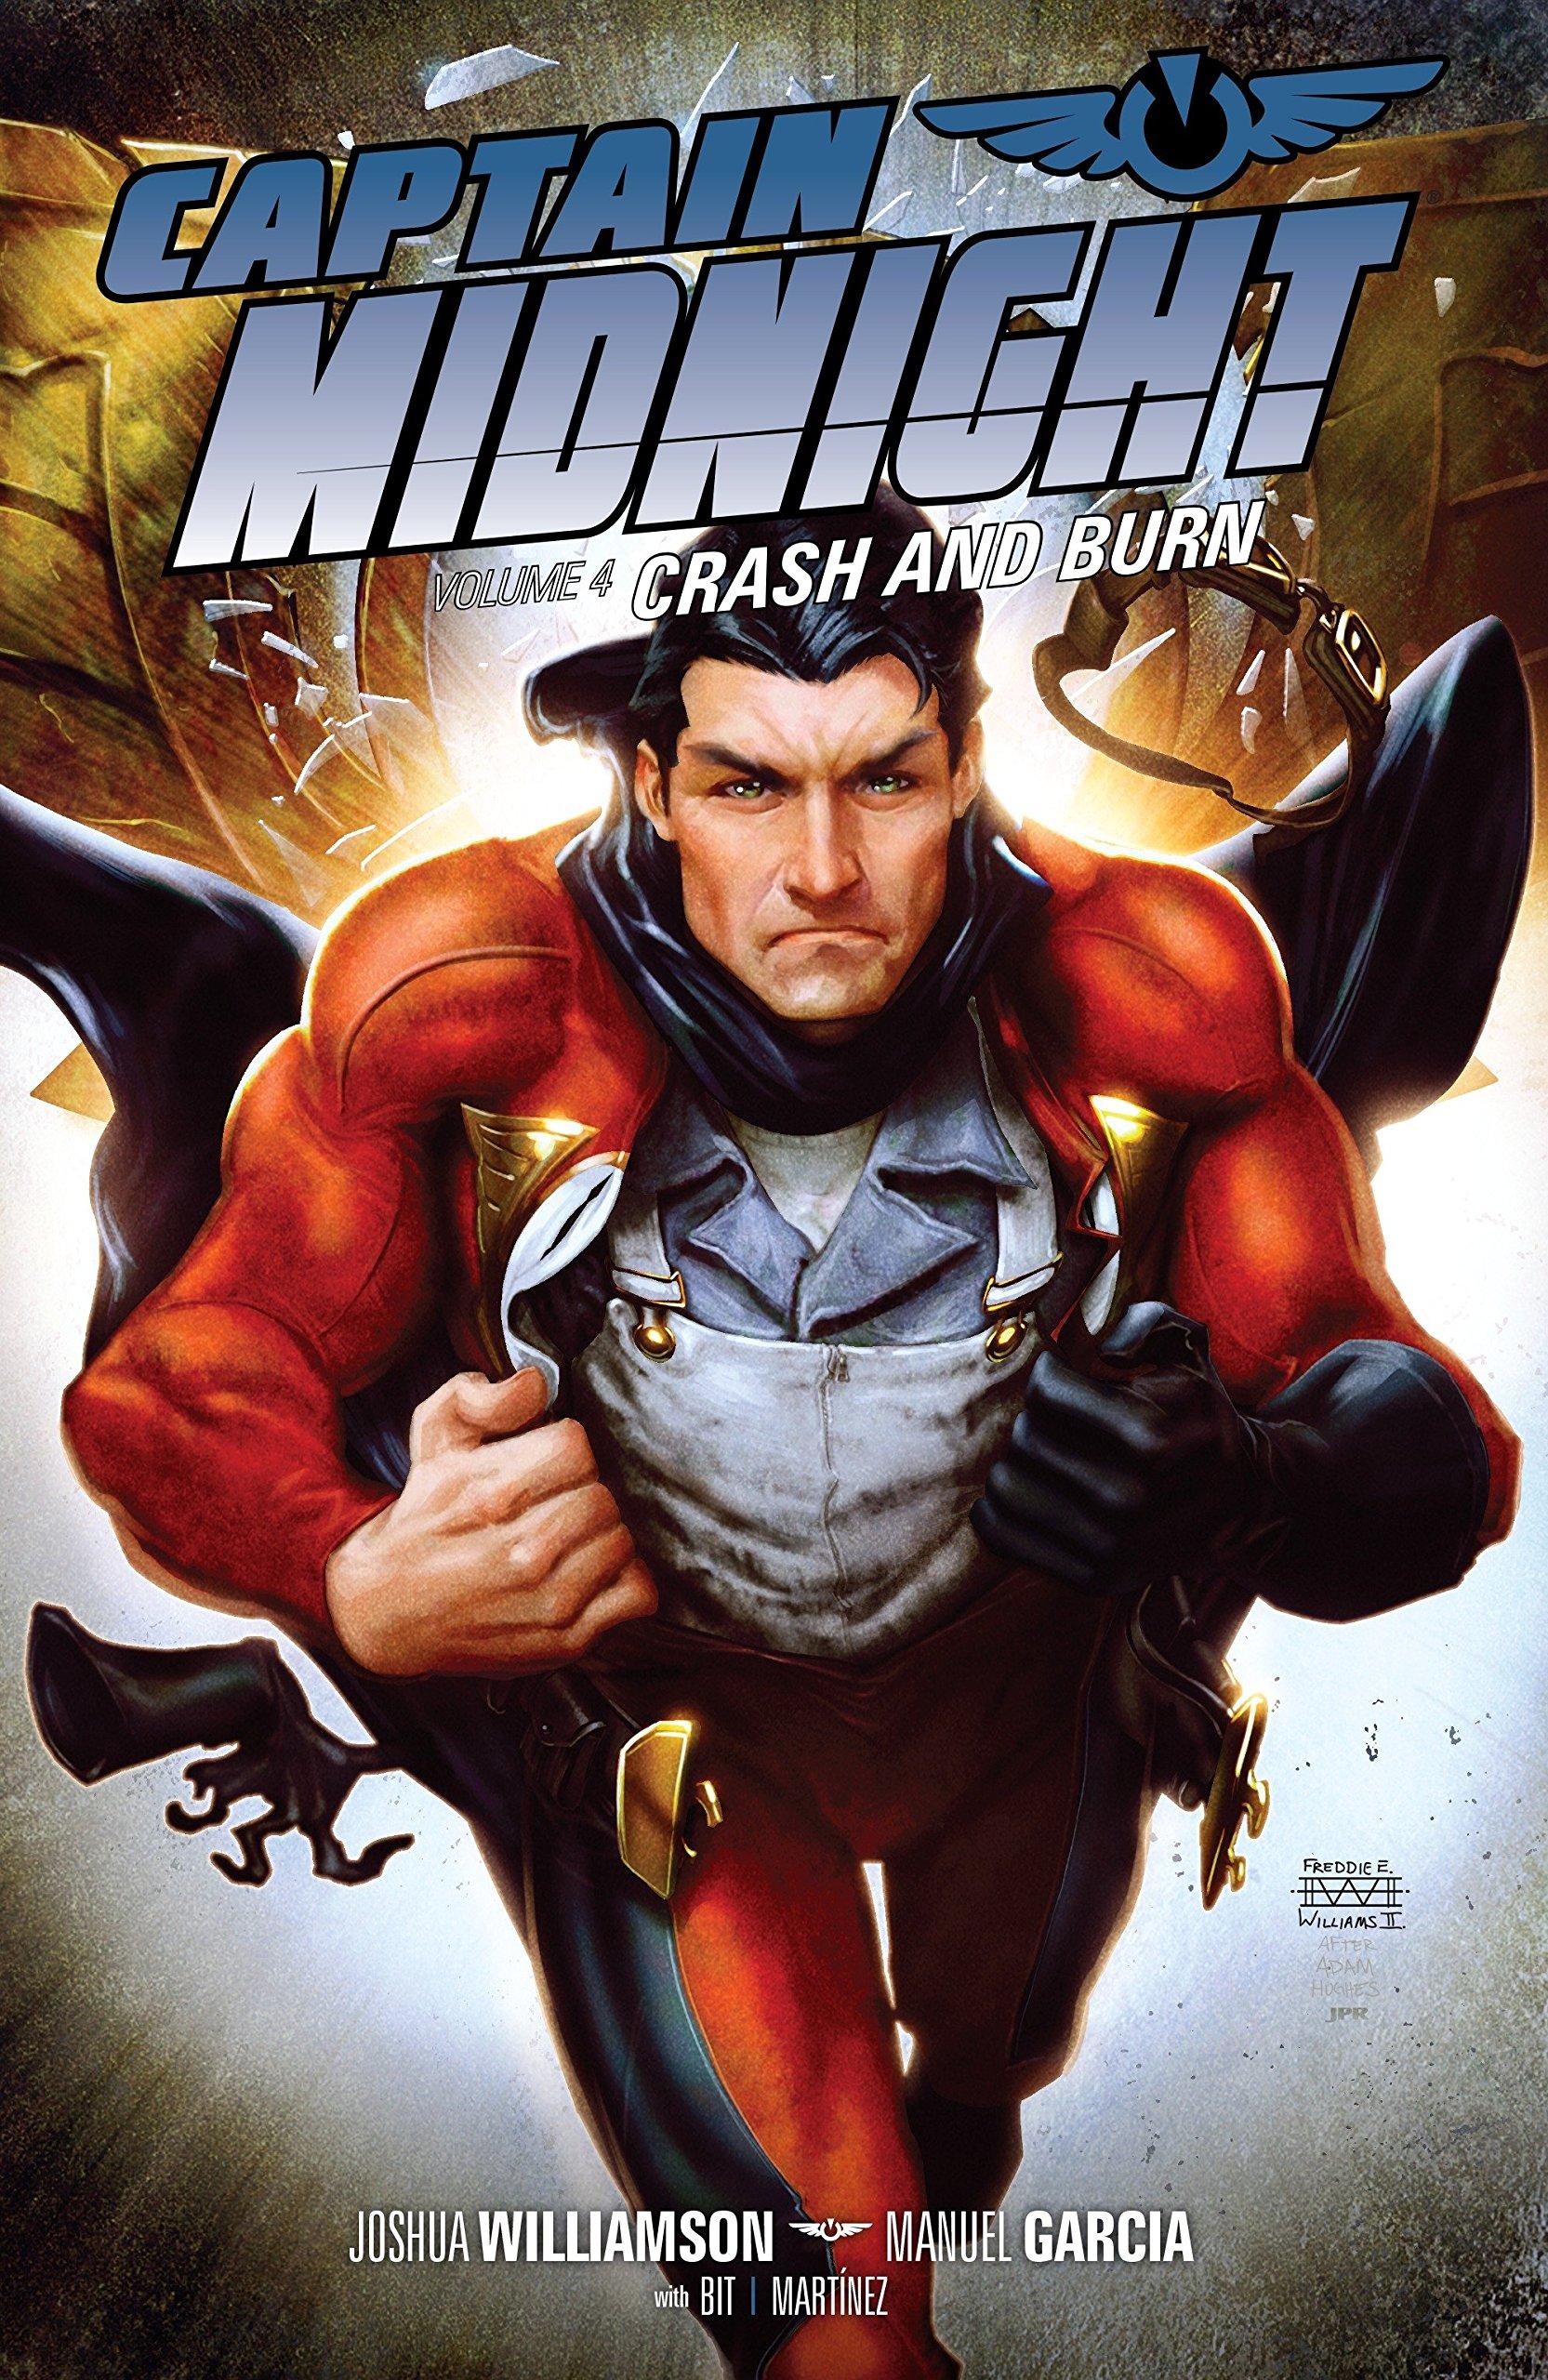 Captain Midnight Volume 4: Crash and Burn by Dark Horse Books